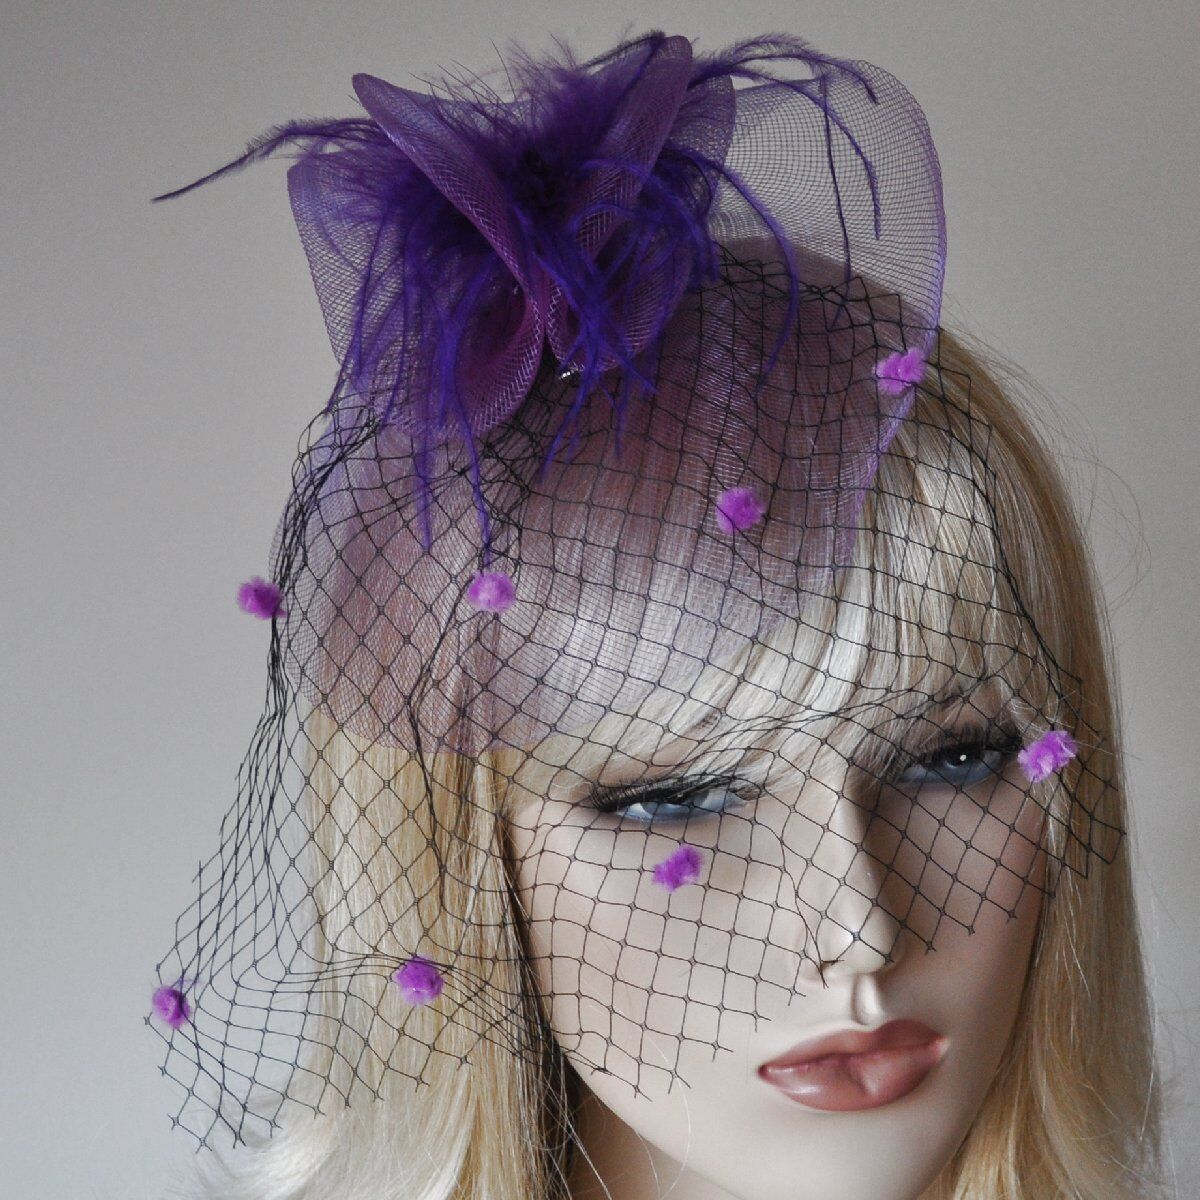 Hair Gesteck Purple Lilac Fascinator Veil Dots Hair Accessories Net Feathers